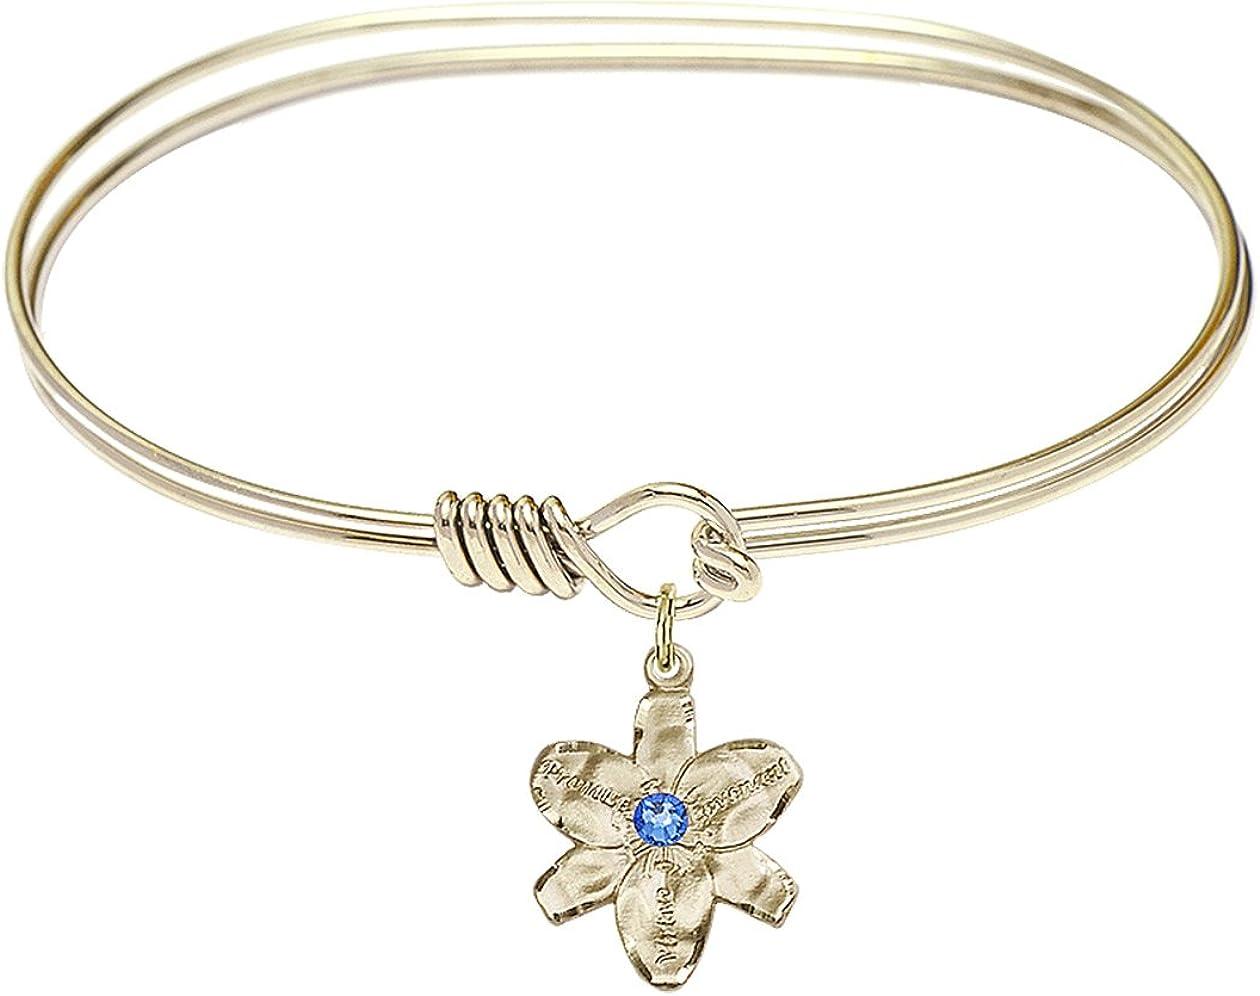 DiamondJewelryNY Excellence Eye Hook Bangle Bracelet a Wholesale Chastity with Charm.